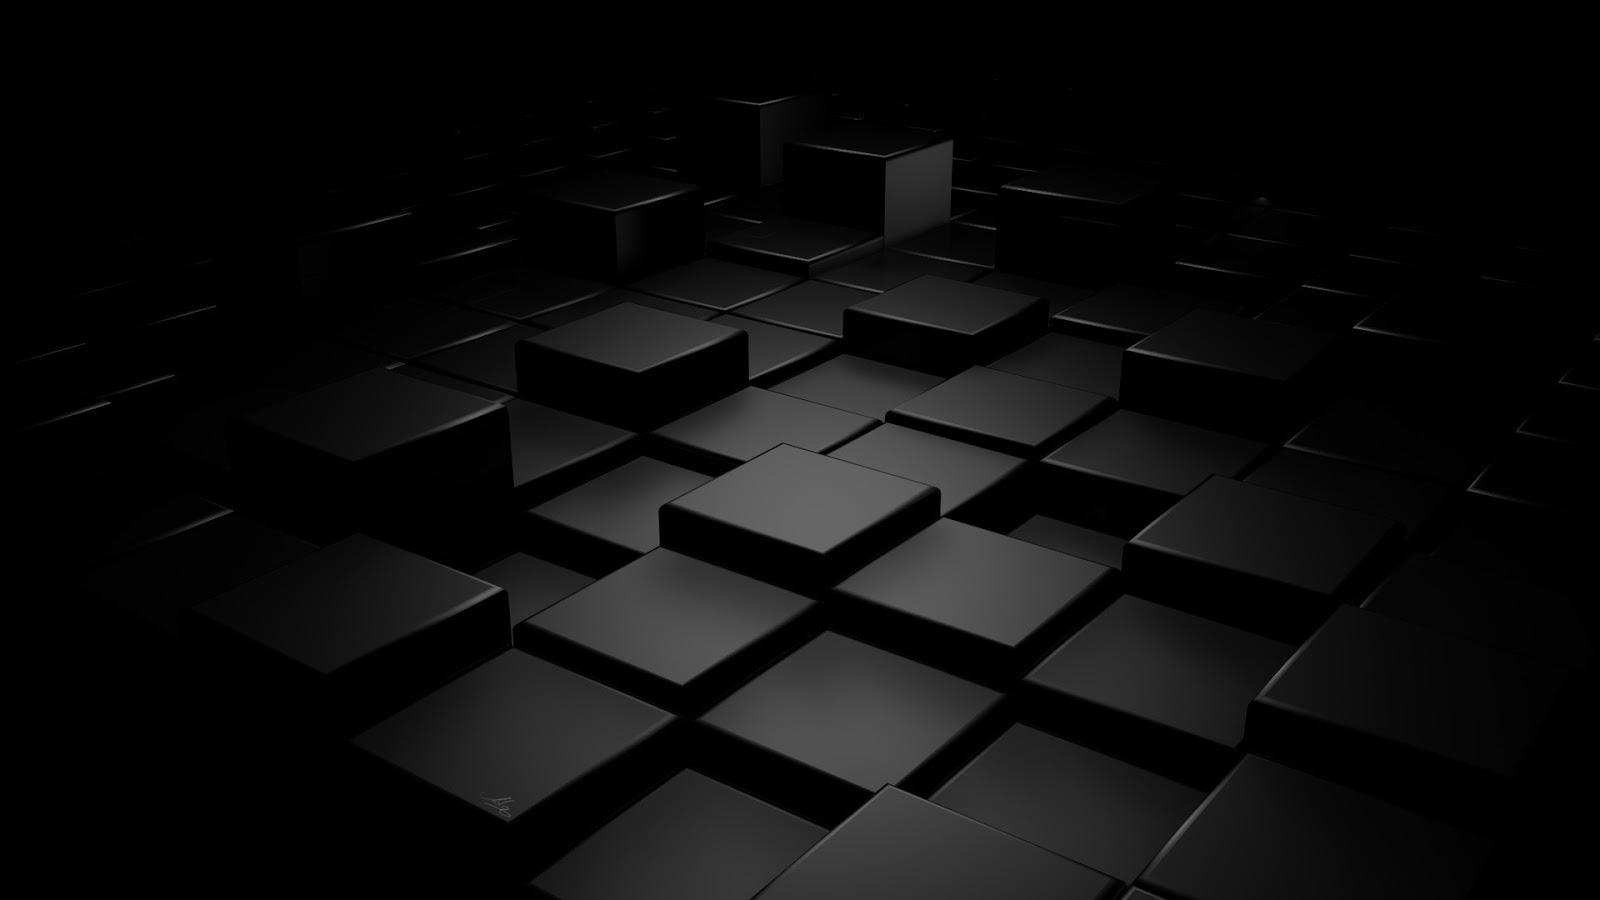 Fond D Écran Noir fond d'écran noir - fond d'écran hd